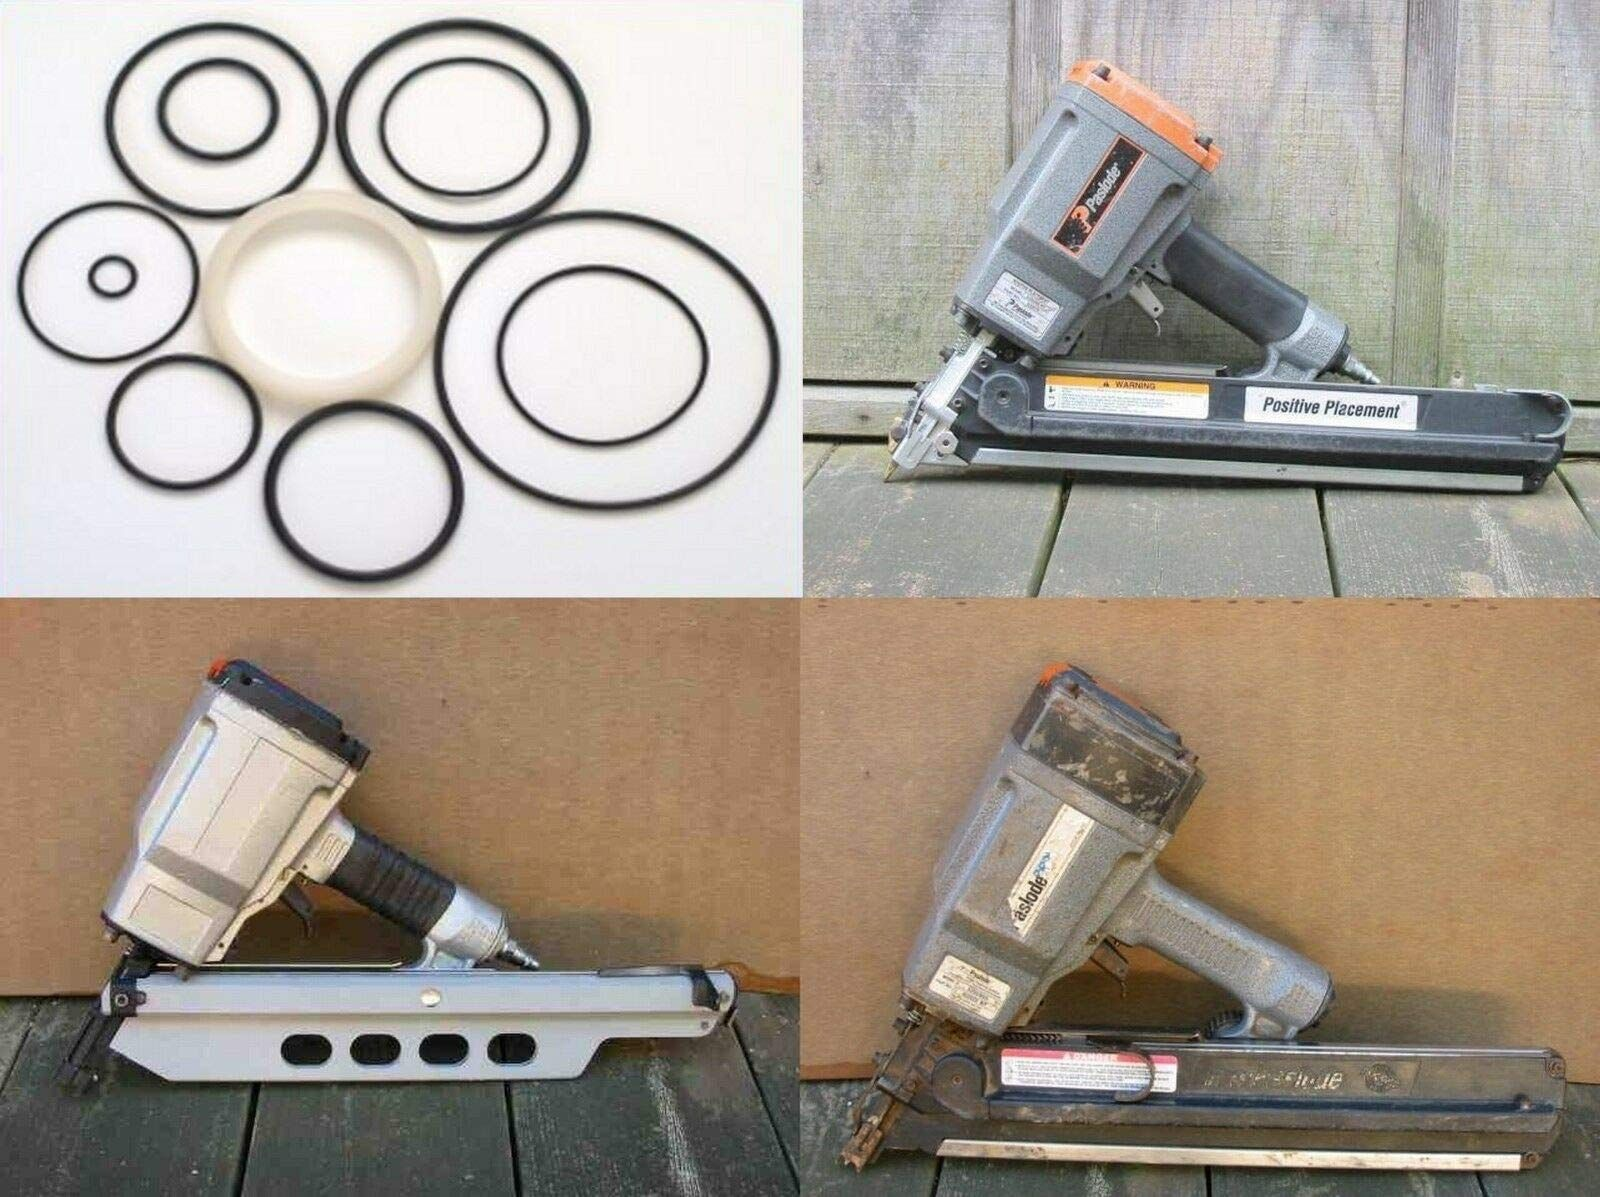 Rebuild Kit For Paslode Framing Nailer Orings 402011 Kit All 5300 Series 5325 80 5350 90s Pm Part 404030 403040 402025 In 2020 Framing Nailers Air Tools Nailer